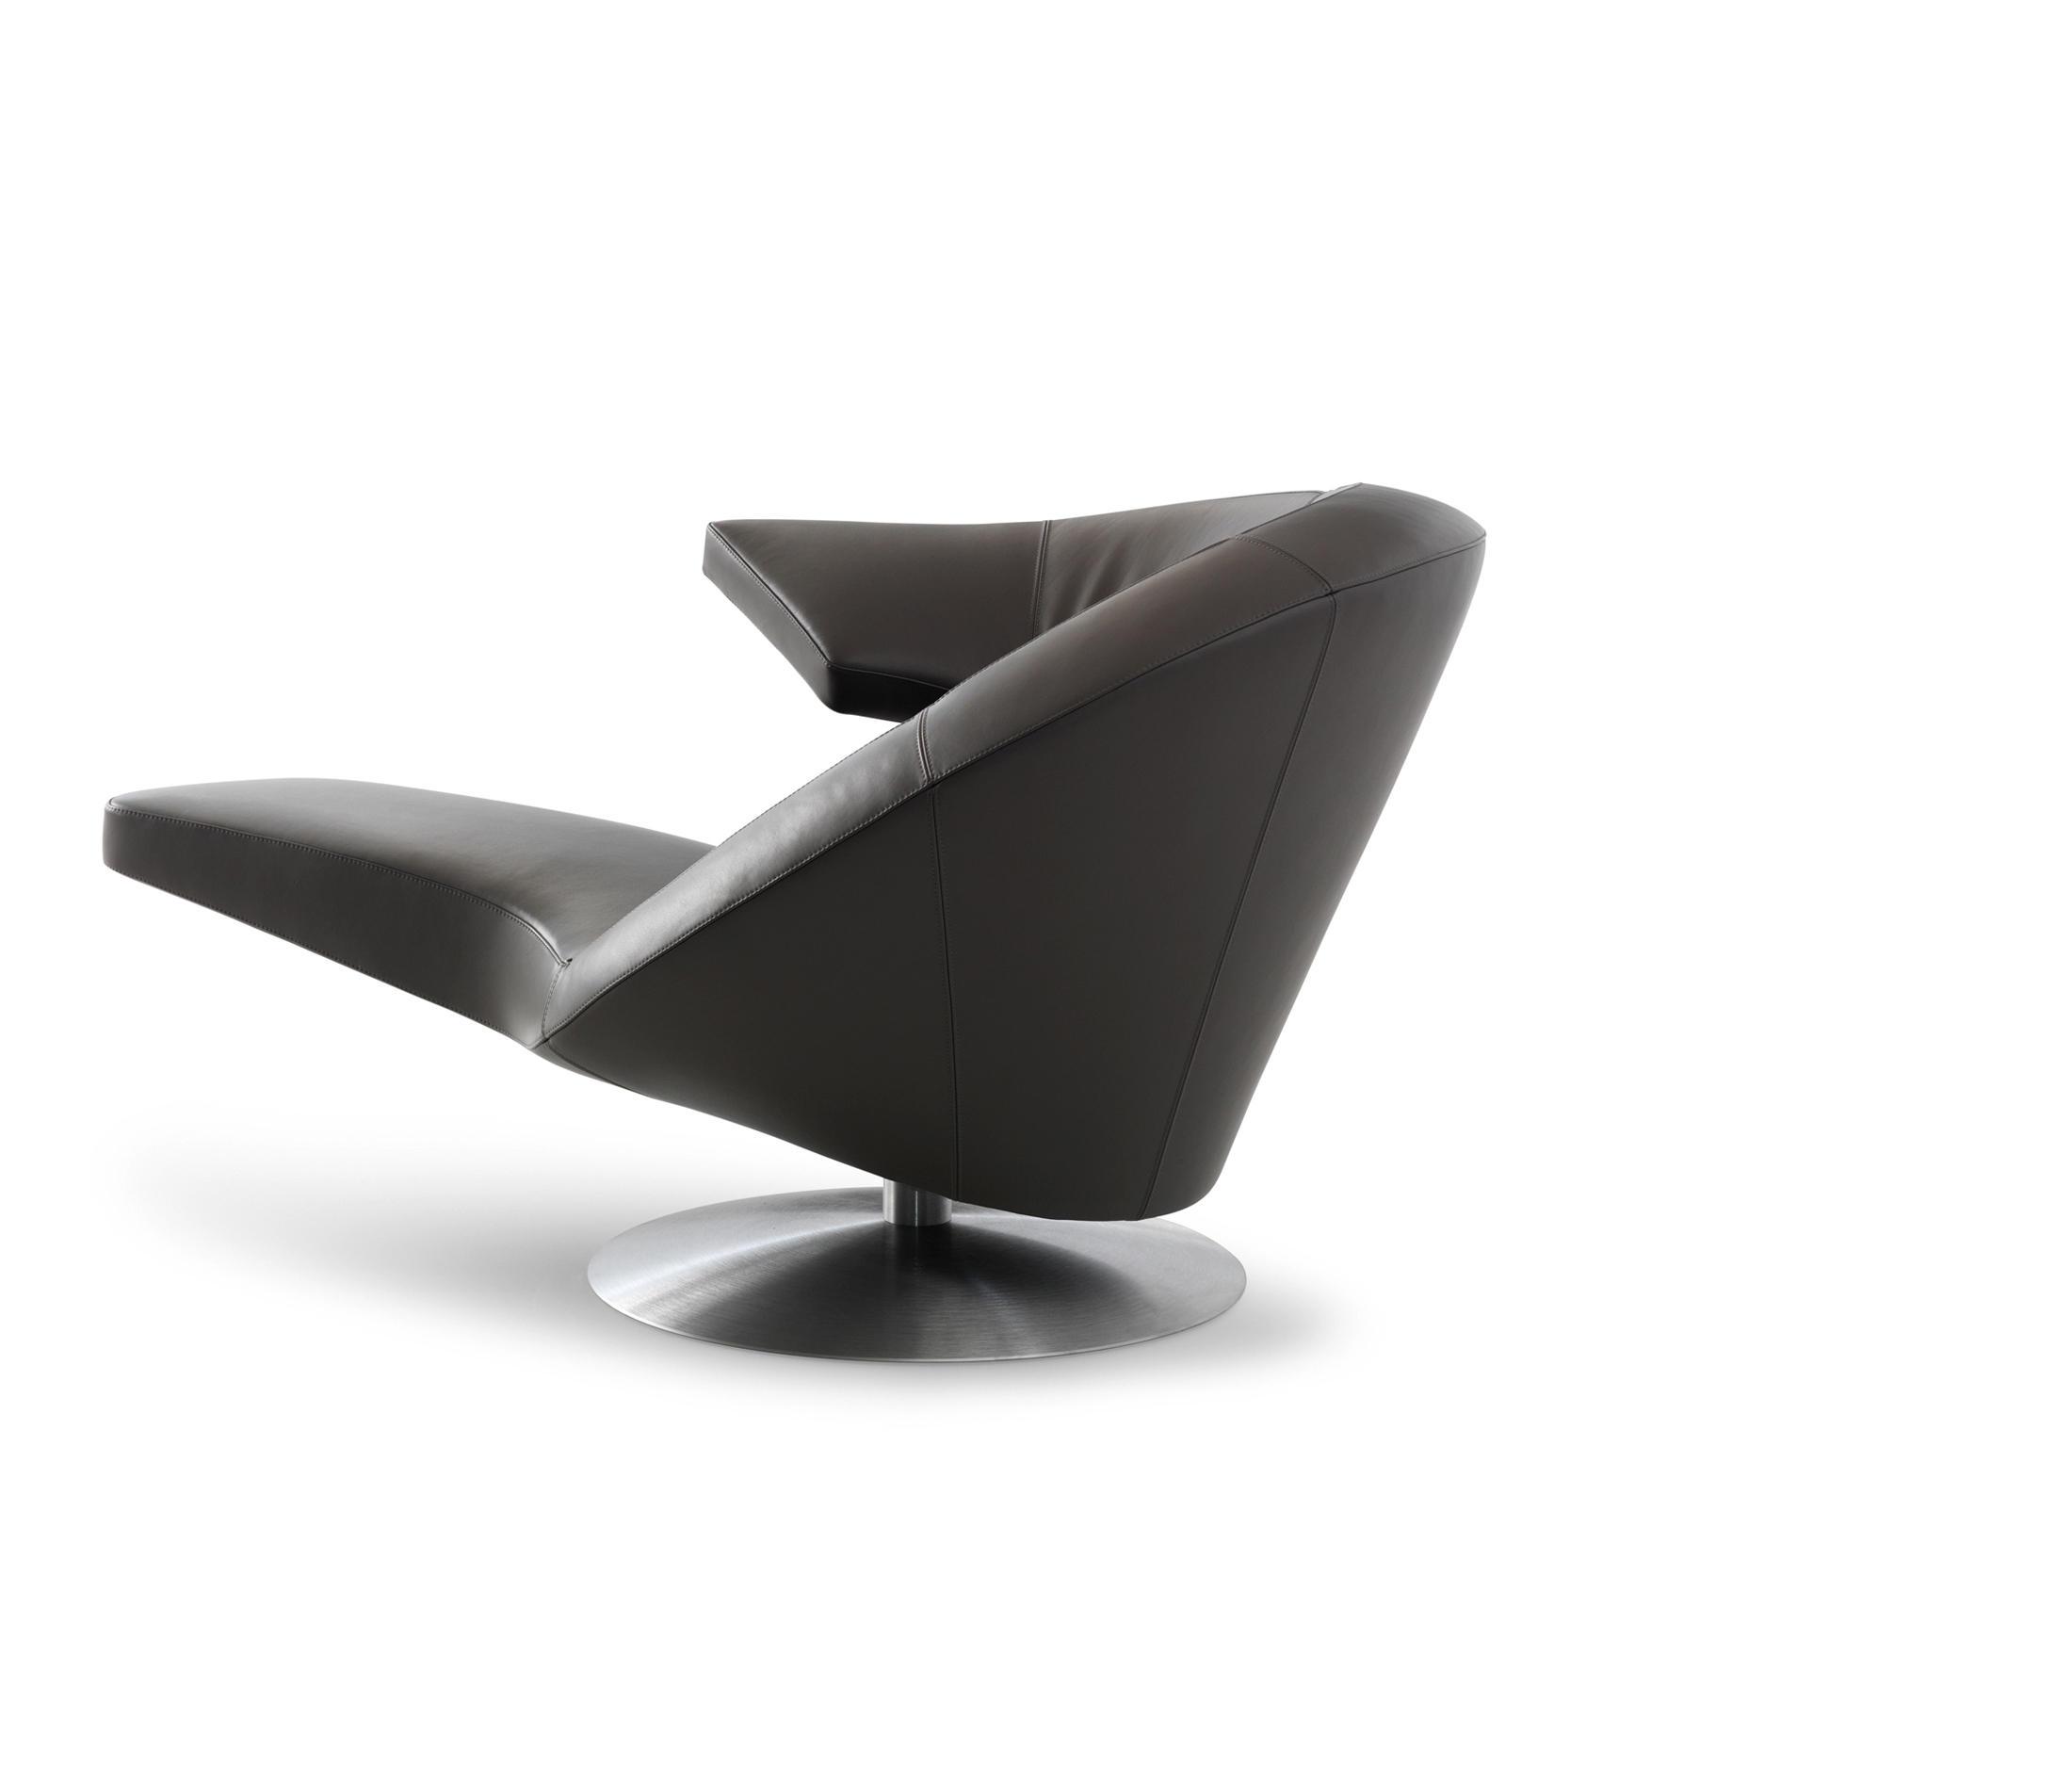 Merveilleux ... Parabolica Armchair By Leolux | Chaise Longues ...